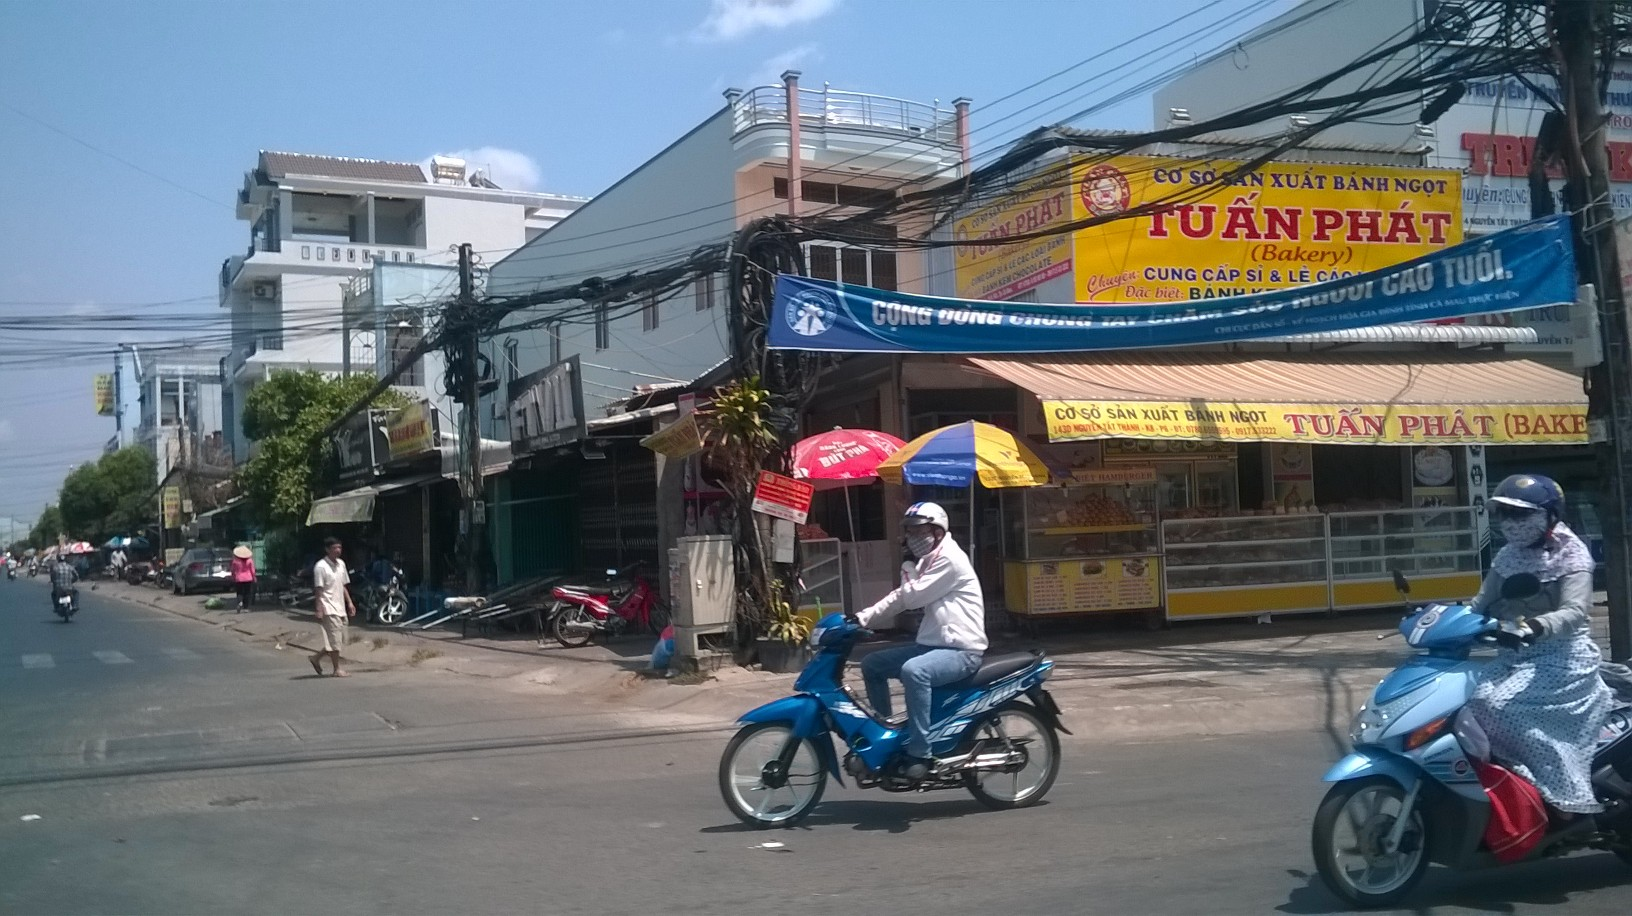 ca mau architecture city street mar16